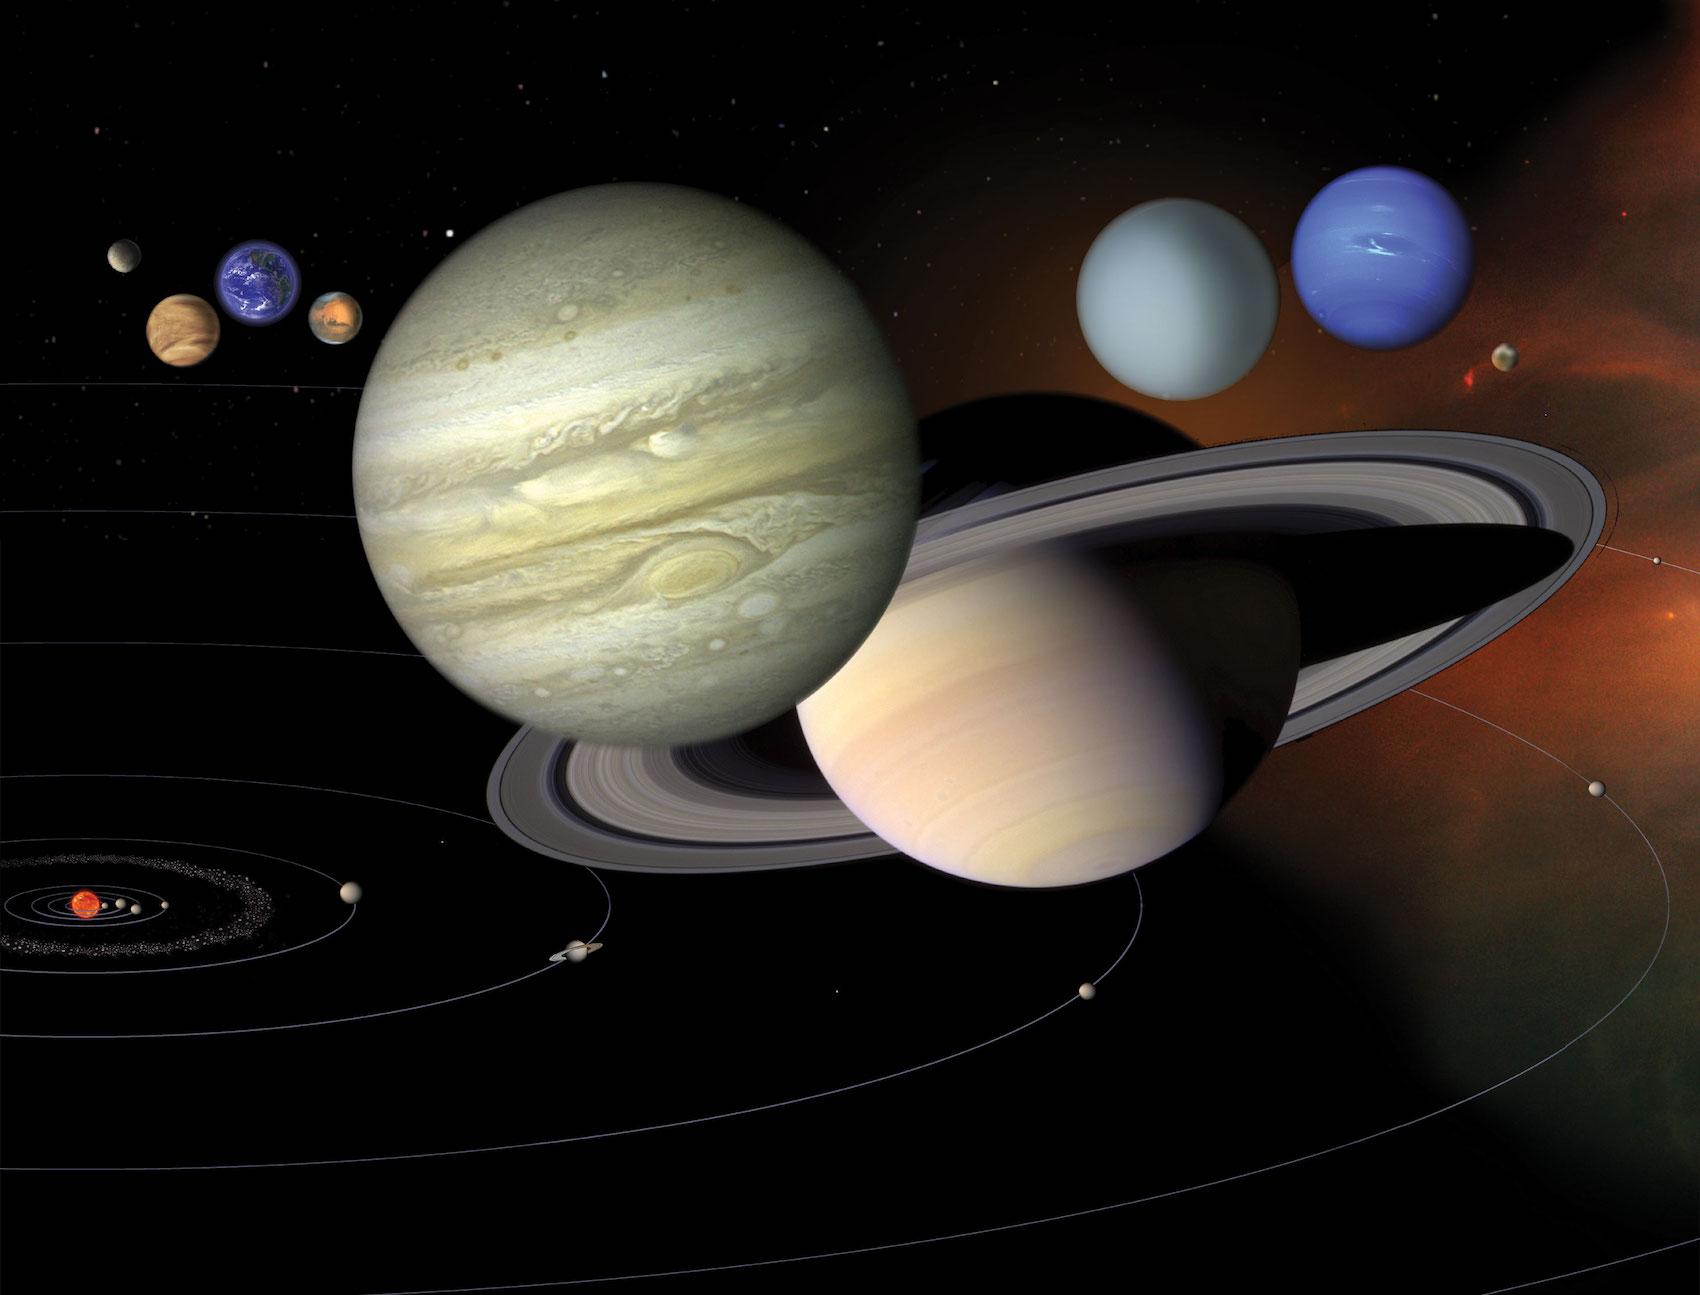 More Evidence for Rare Solar System Doctrine